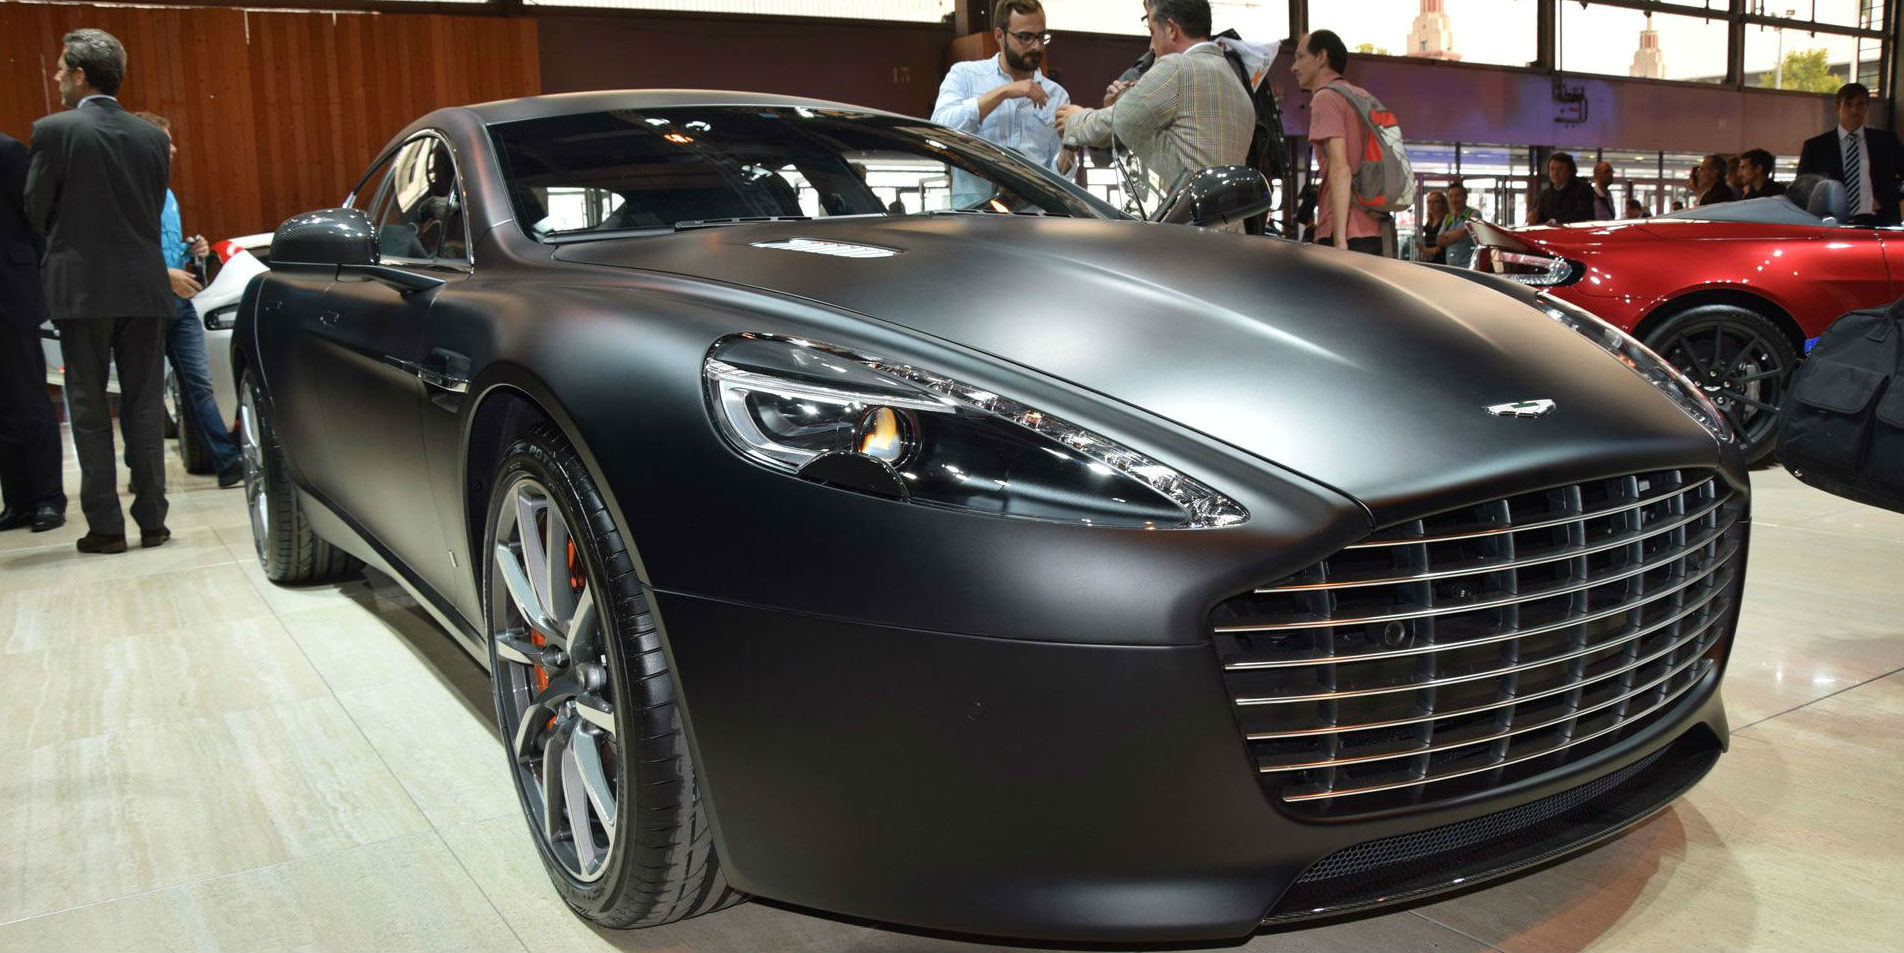 new Aston Martin Rapide S 2014 Paris Motor Show 6